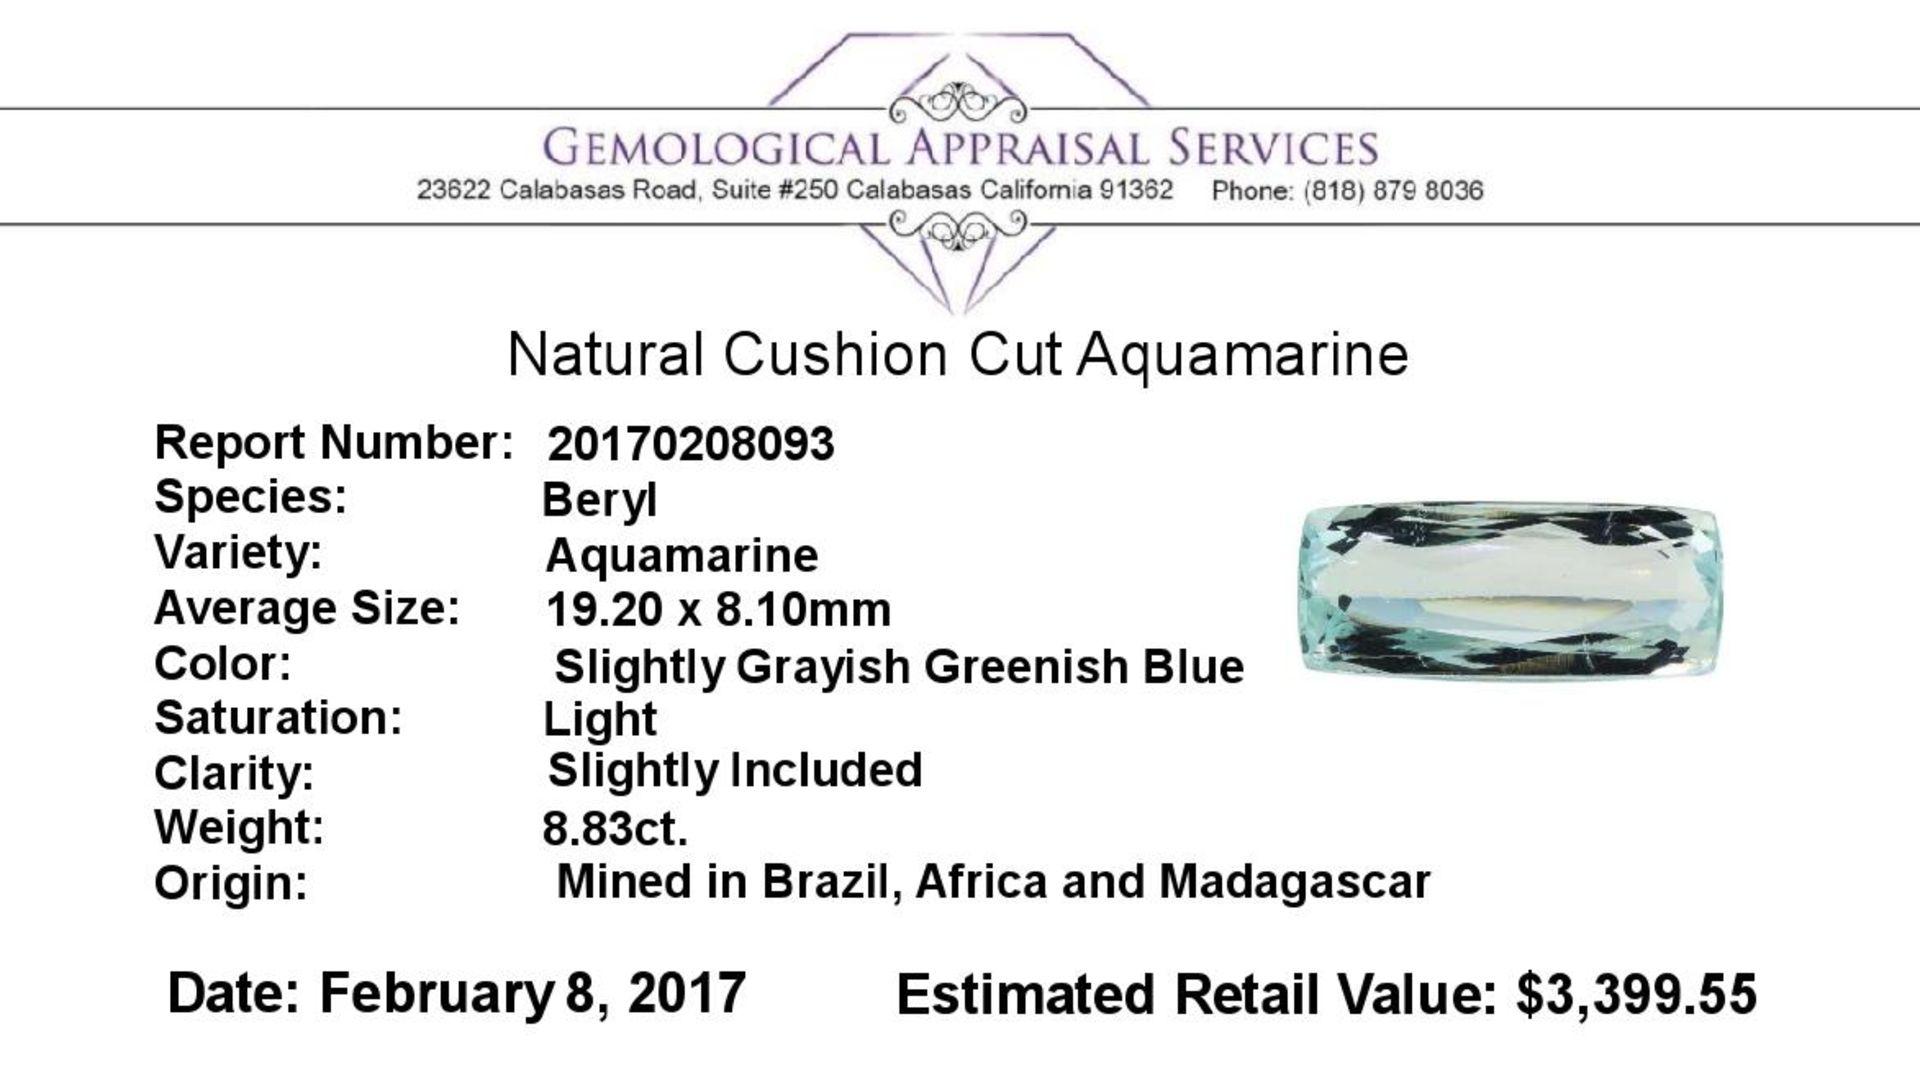 8.83 ct.Natural Cushion Cut Aquamarine - Image 2 of 2